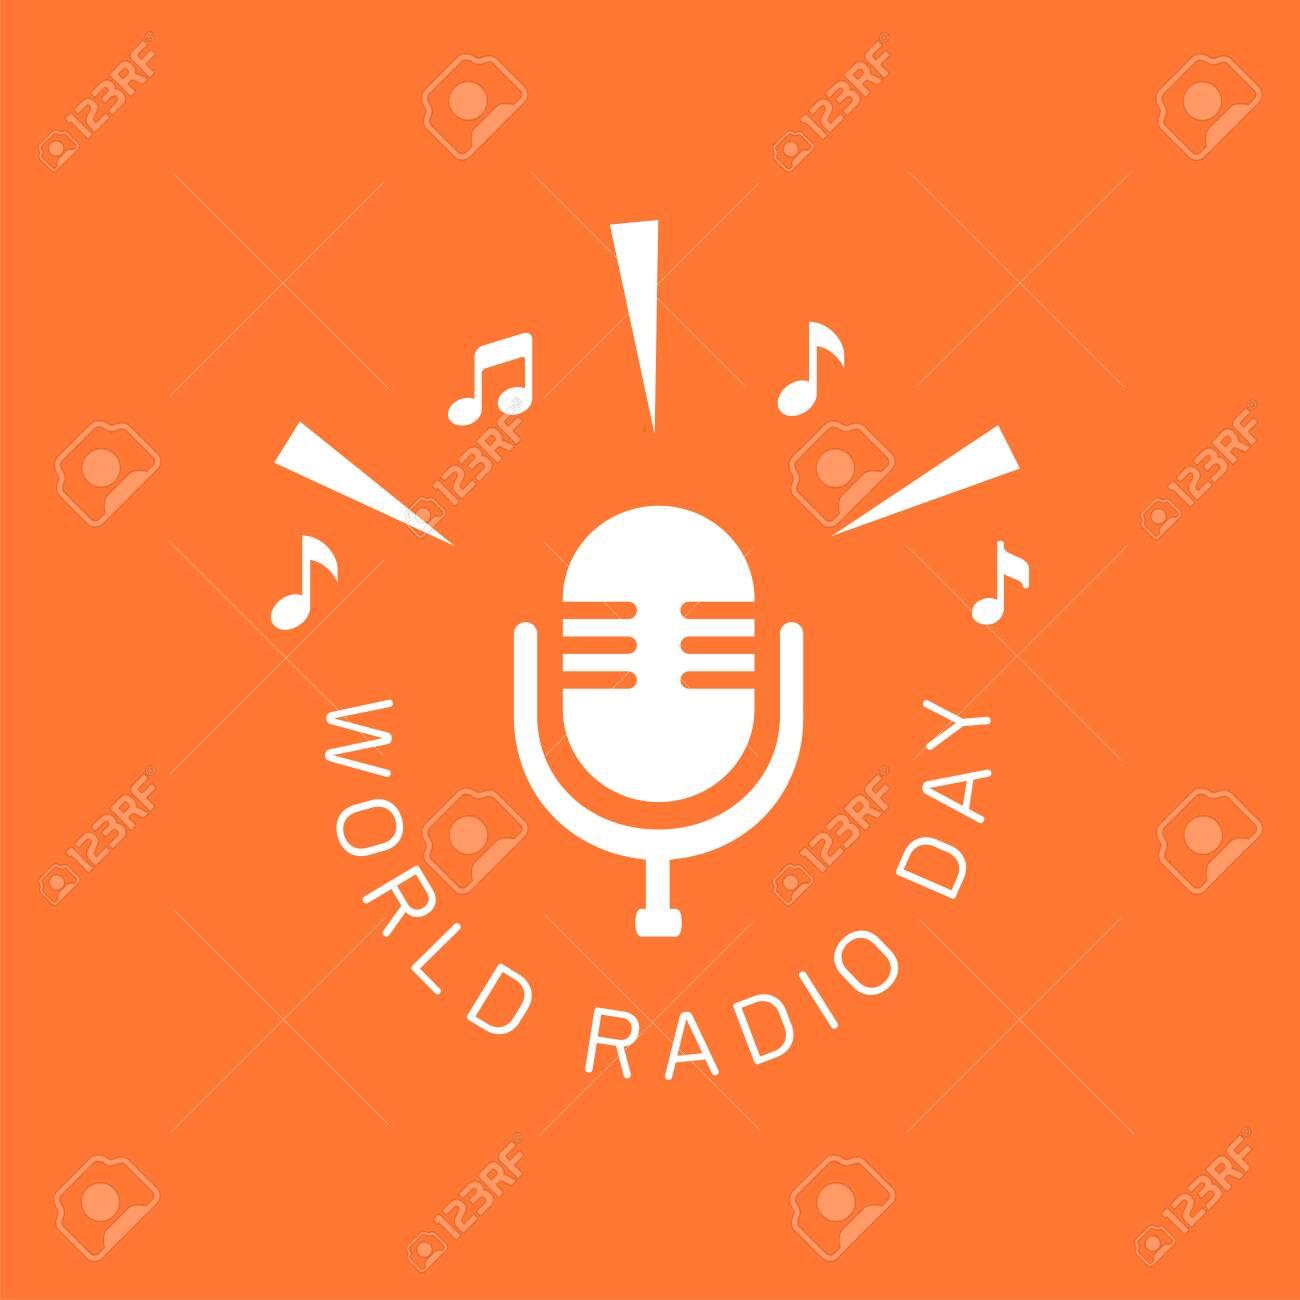 logo design of World radio day for poster, banner or any design - 139841924